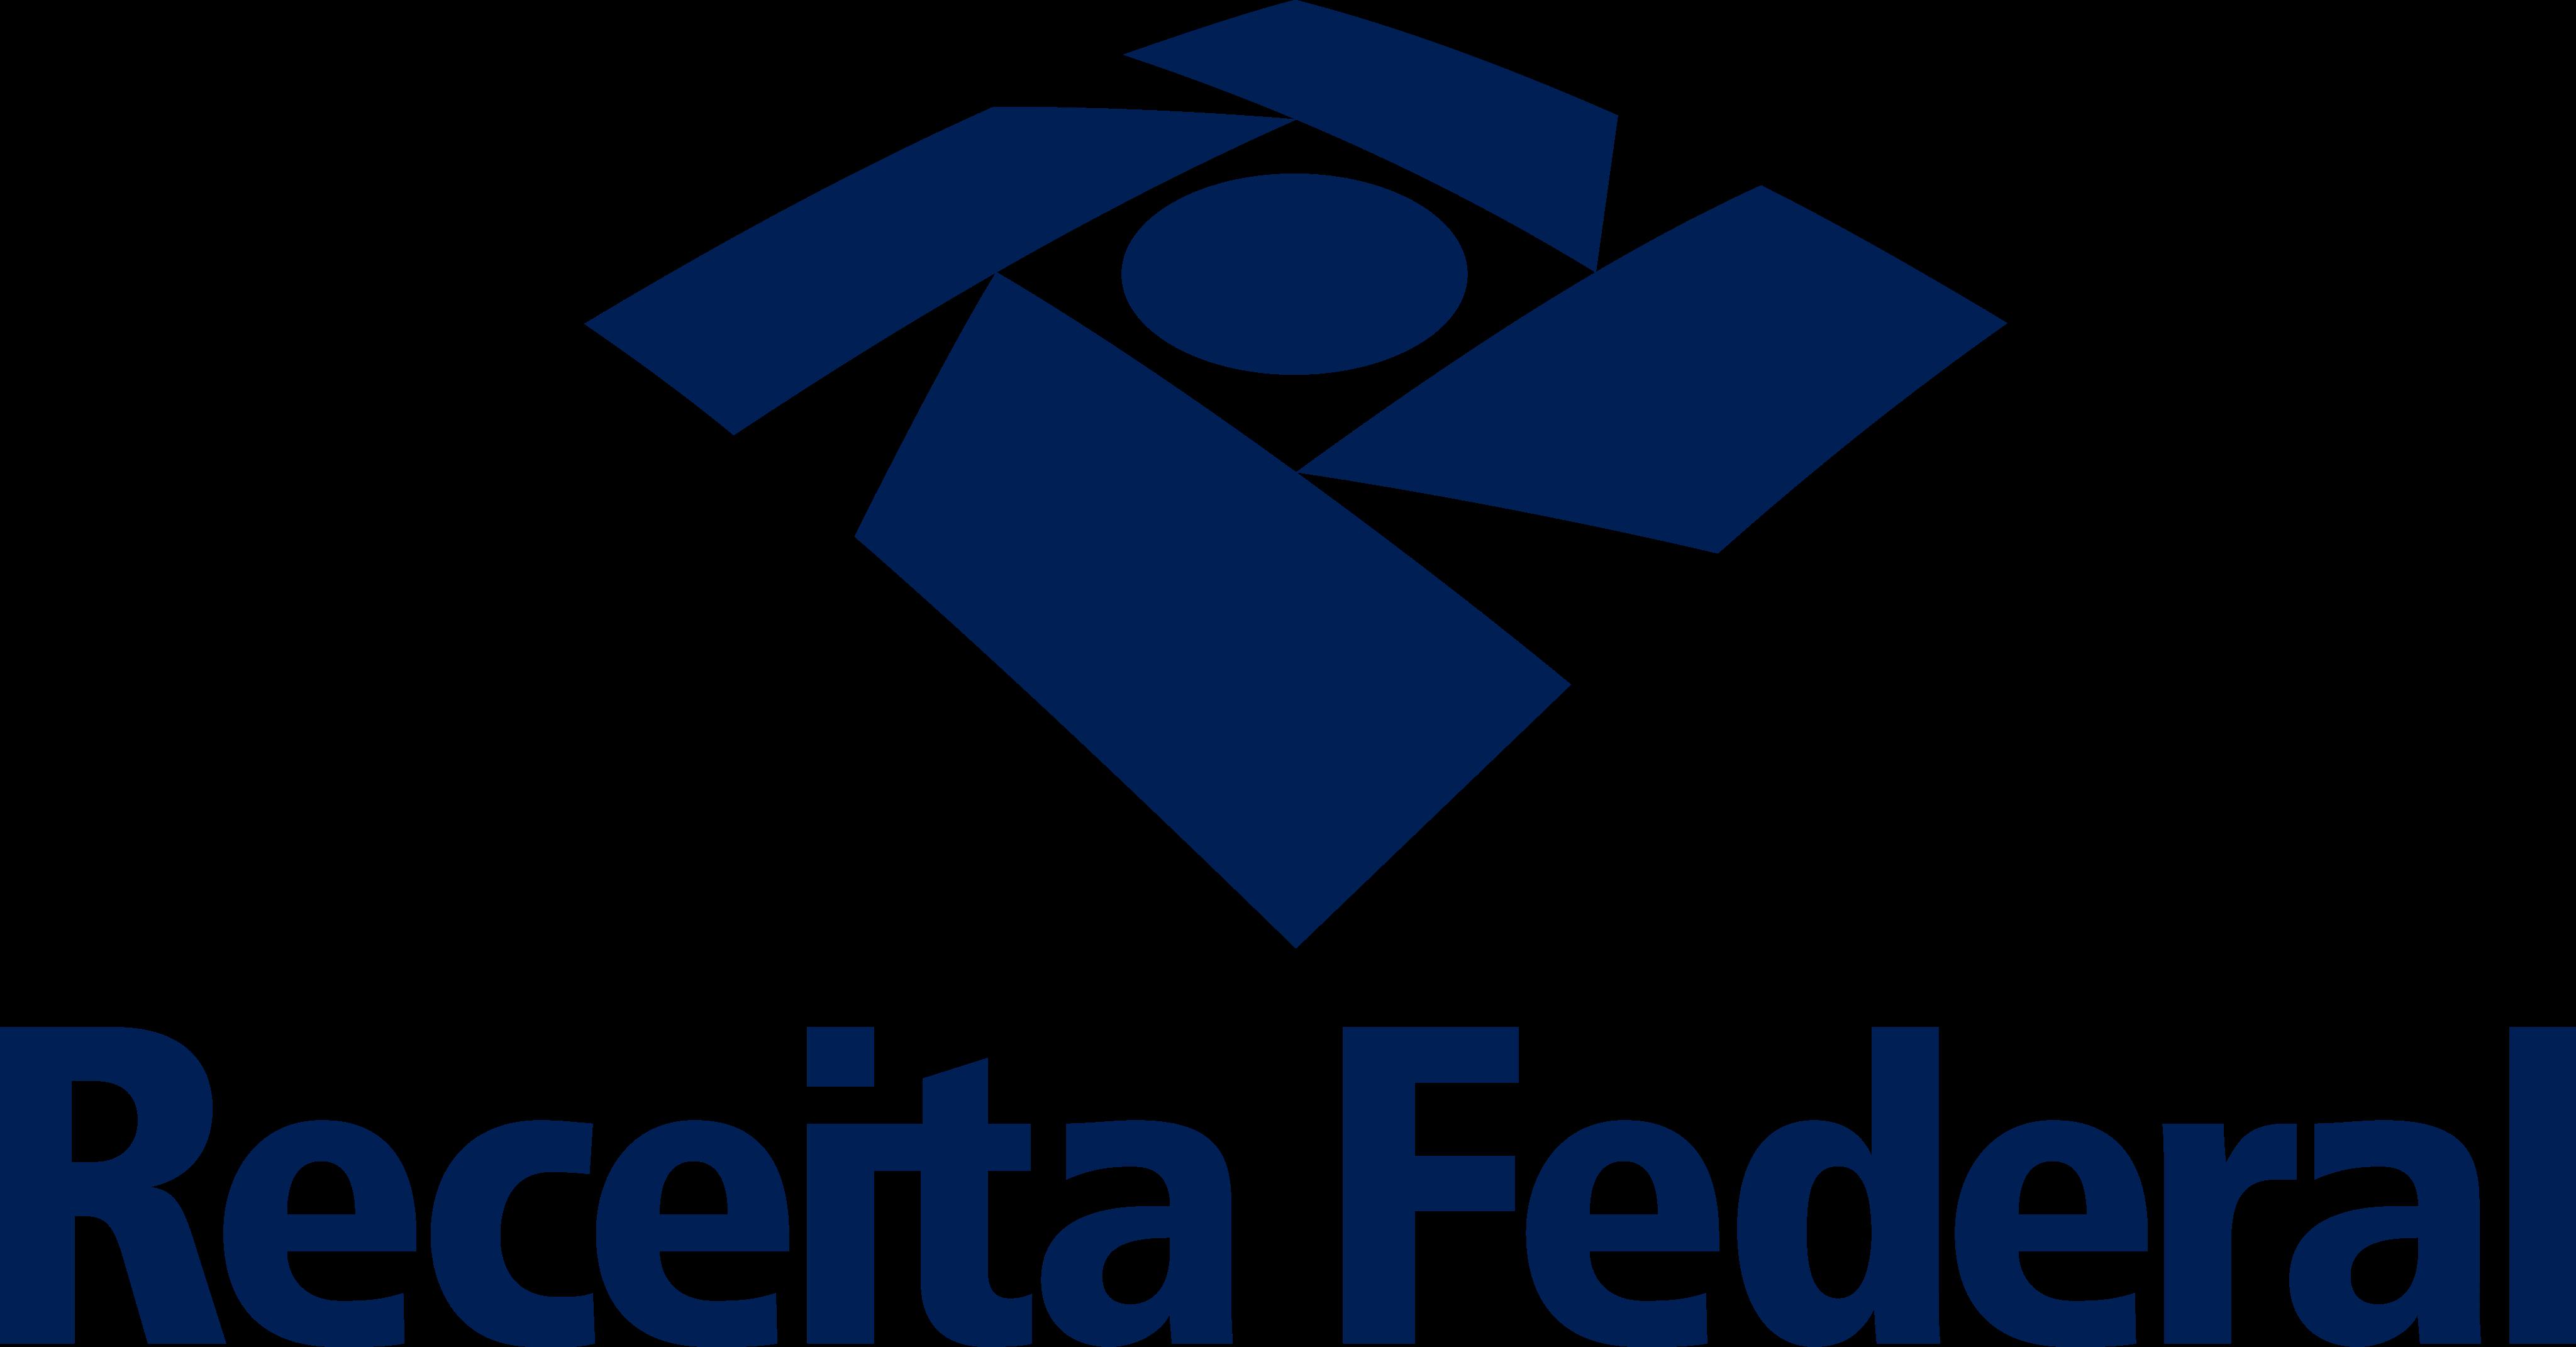 receita federal logo 1 1 - Receita Federal Logo